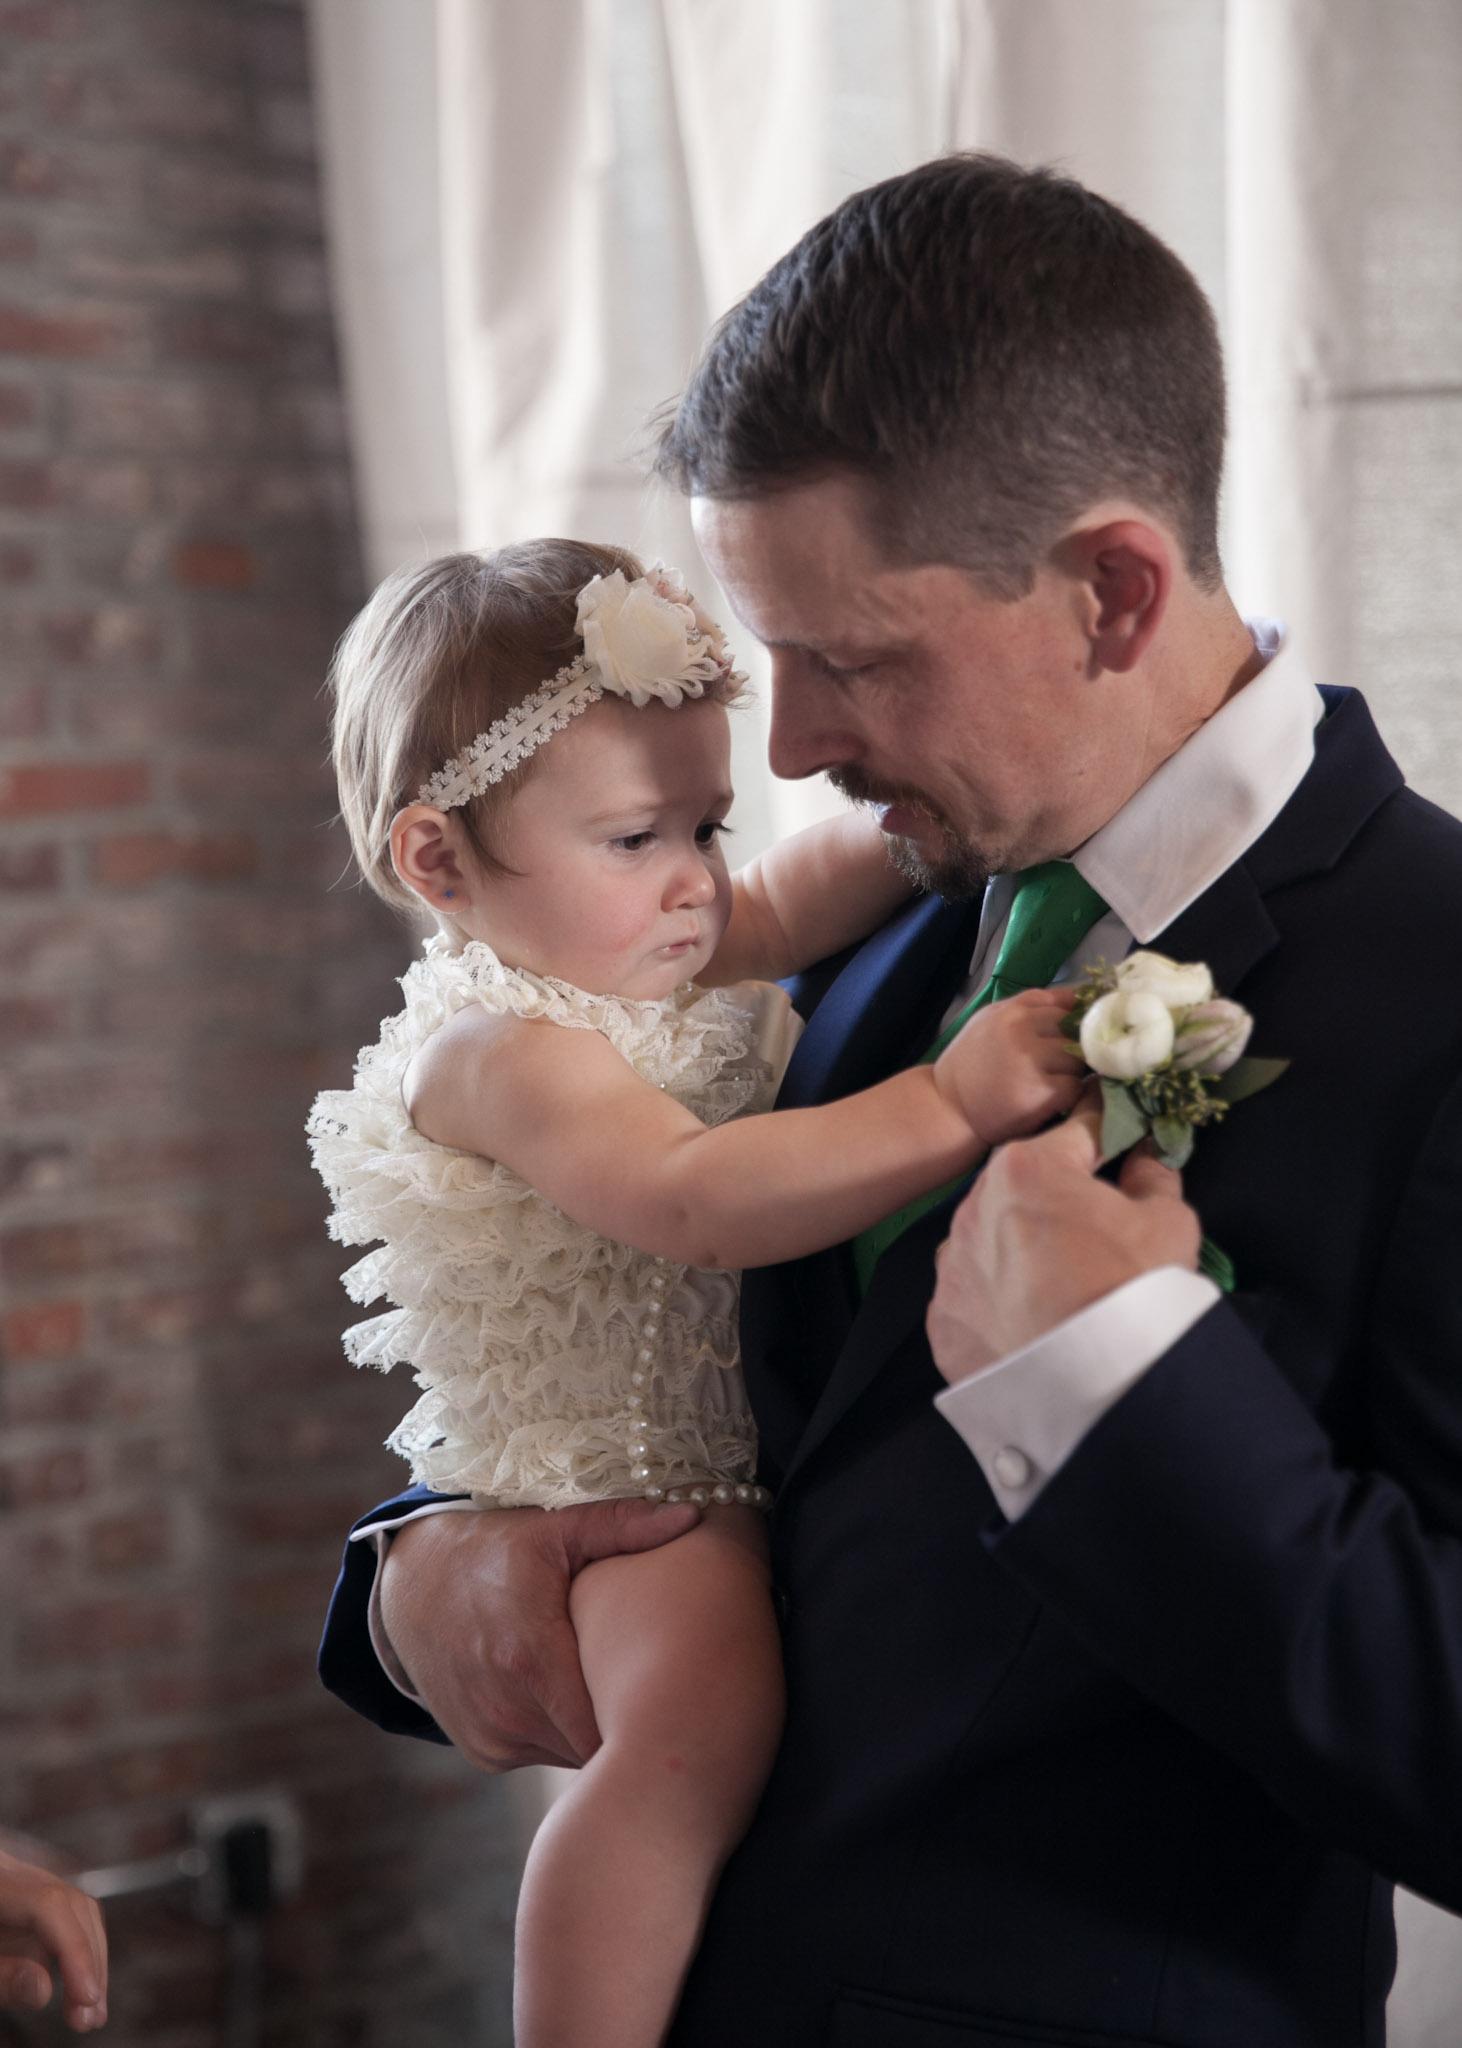 Kansas_City_Small_Wedding_Venue_Elope_Intimate_Ceremony_Budget_Affordable_190A&P.JPG